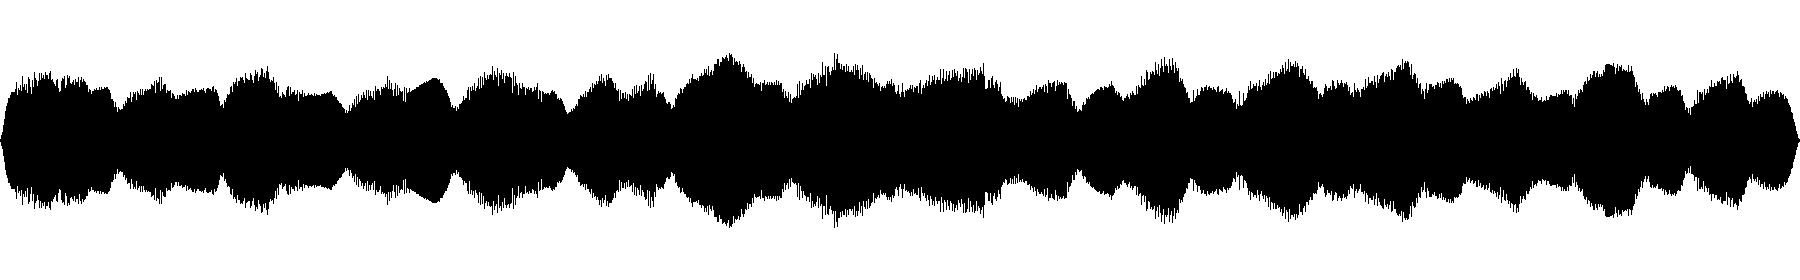 synthloop